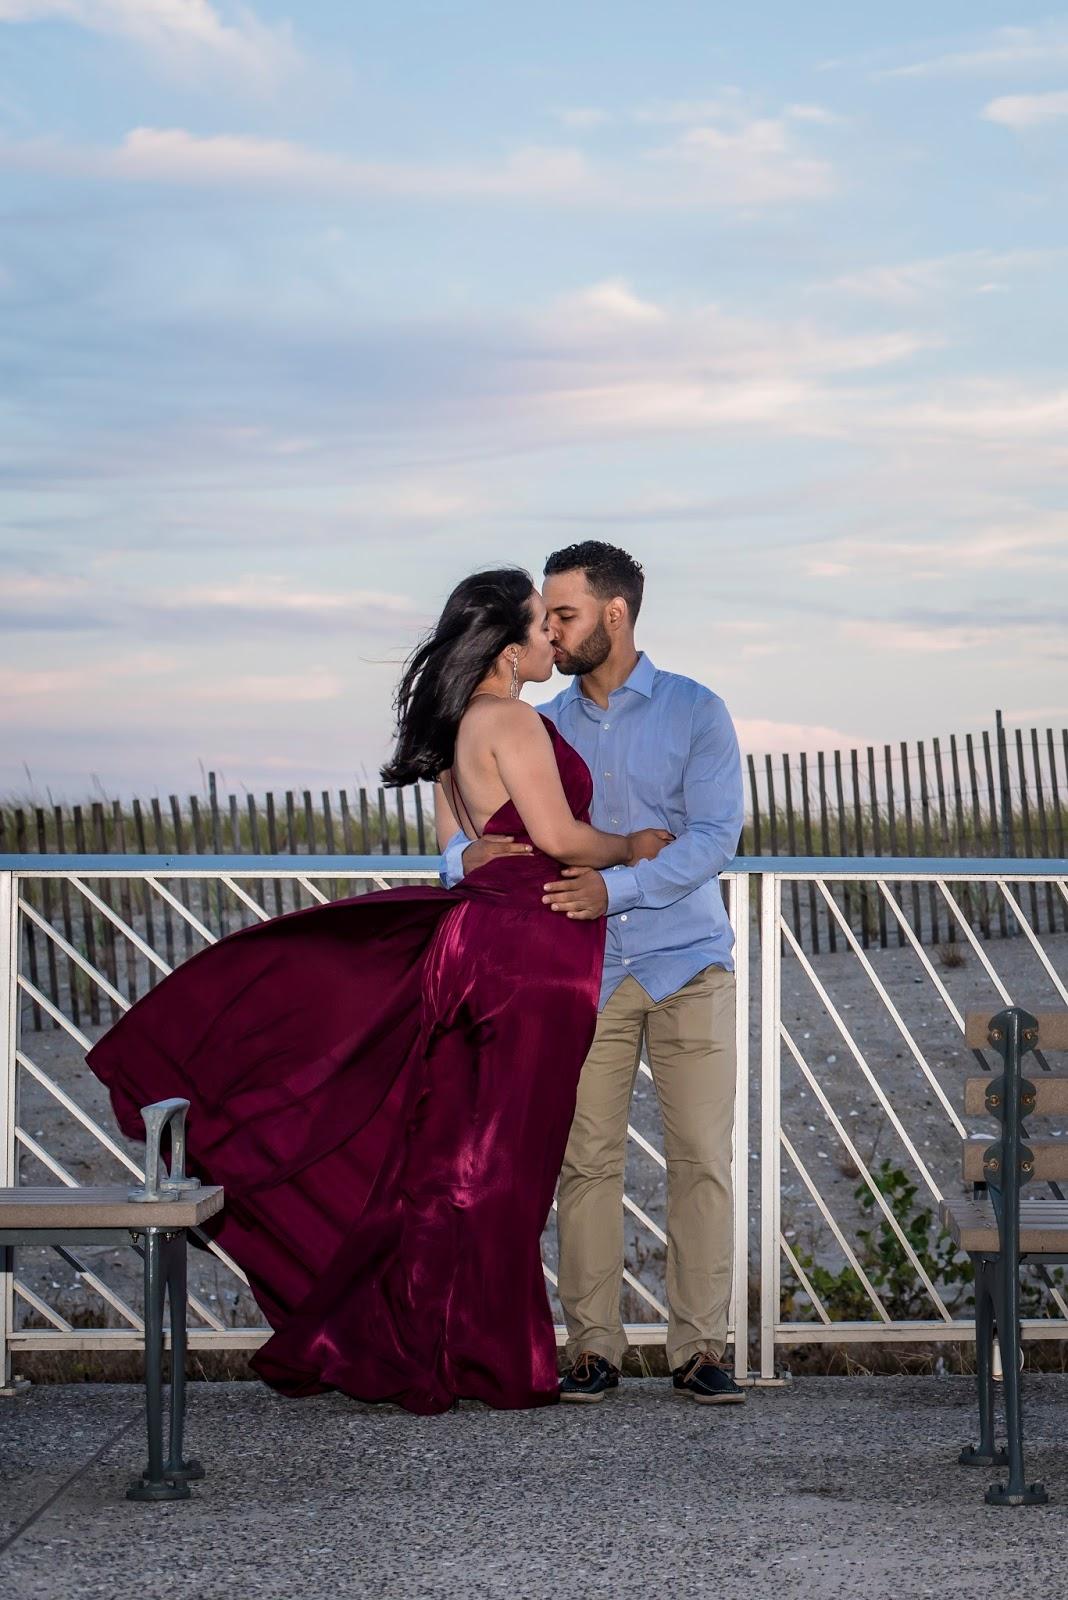 budget engagement and wedding photographer